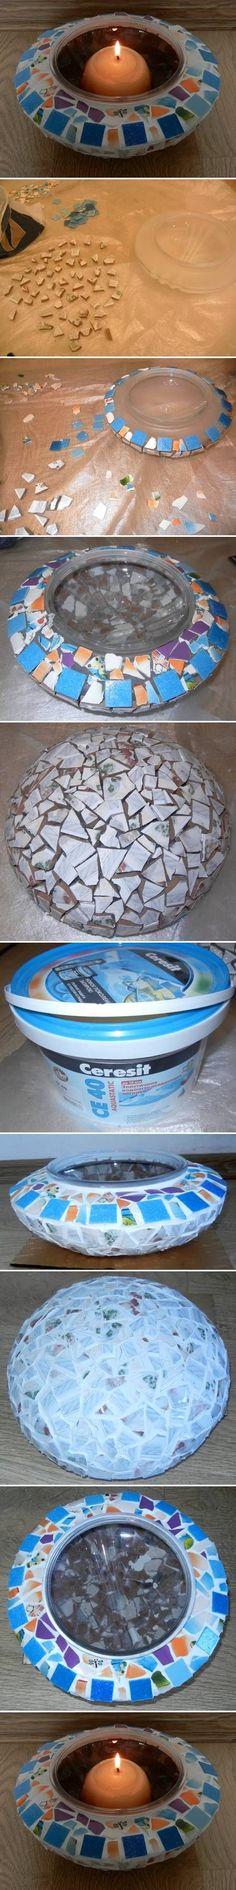 DIY Mosaic Candle Holder DIY Projects / UsefulDIY.com